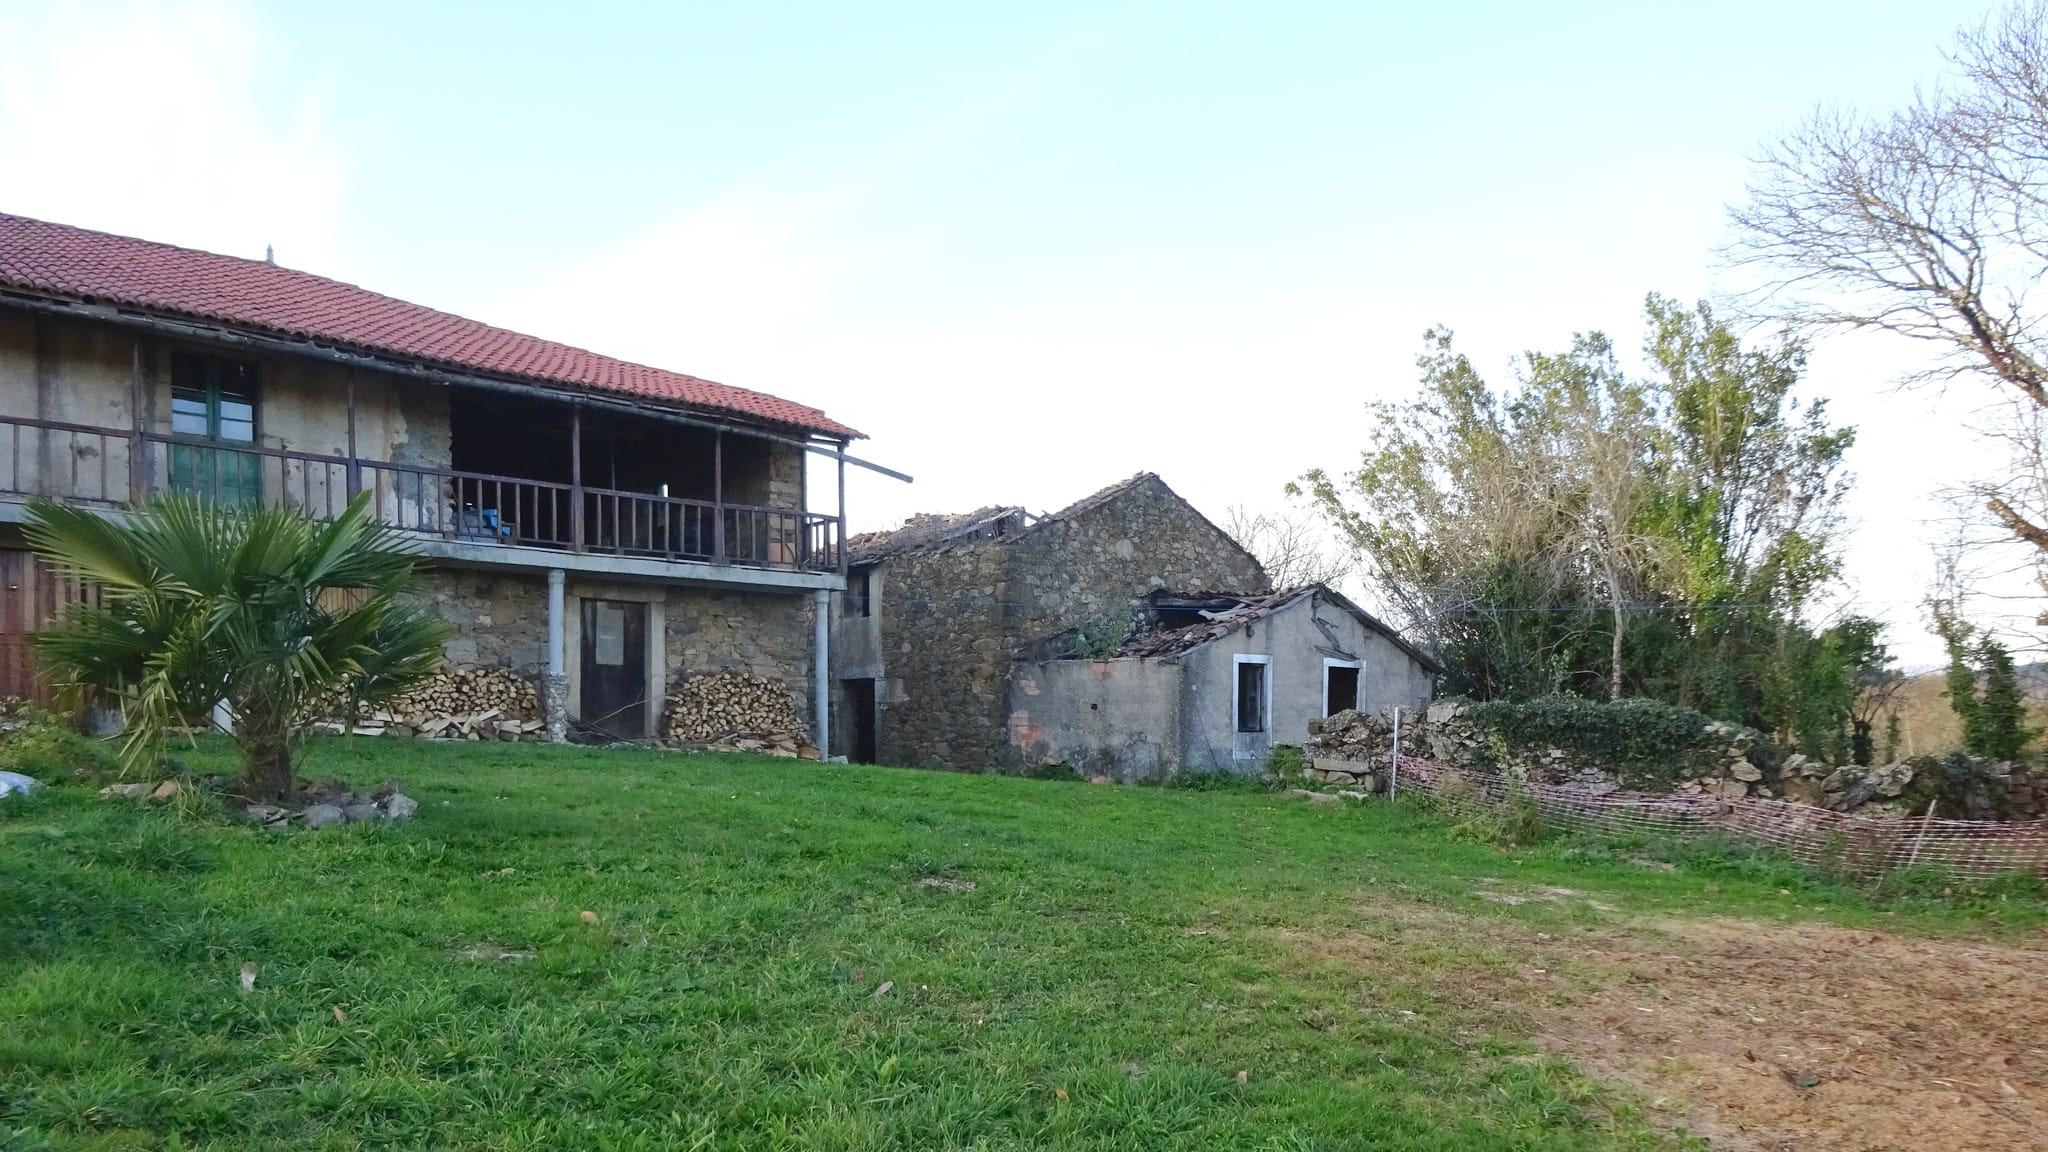 Emprazamento da antiga igrexa parroquial de San Paio de Niñodaguia